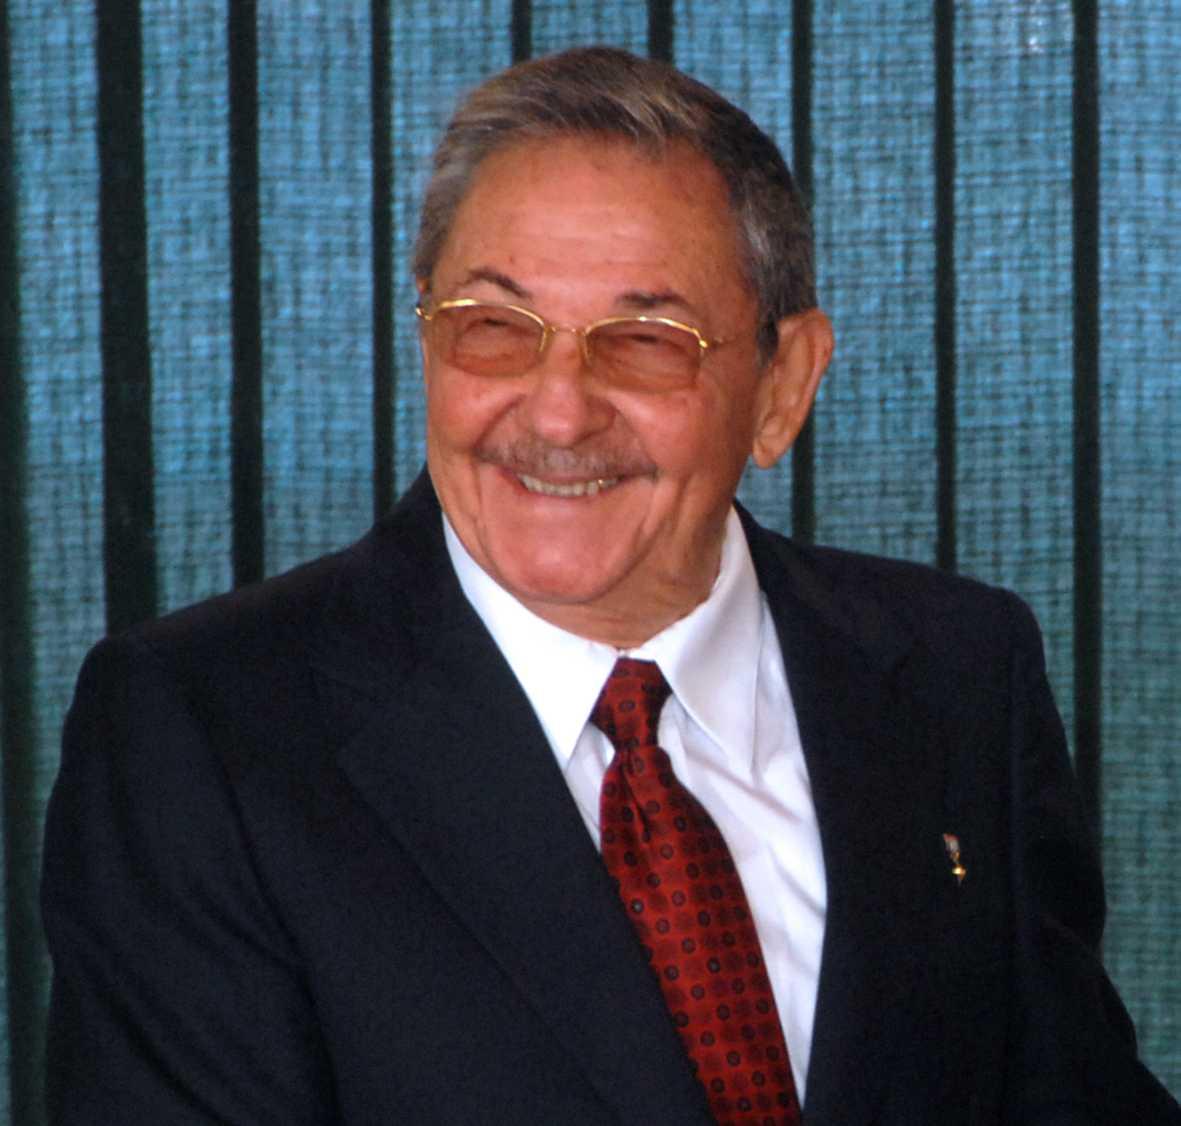 http://upload.wikimedia.org/wikipedia/commons/f/f9/Ra%C3%BAl_Castro_-_2008(edit).jpg